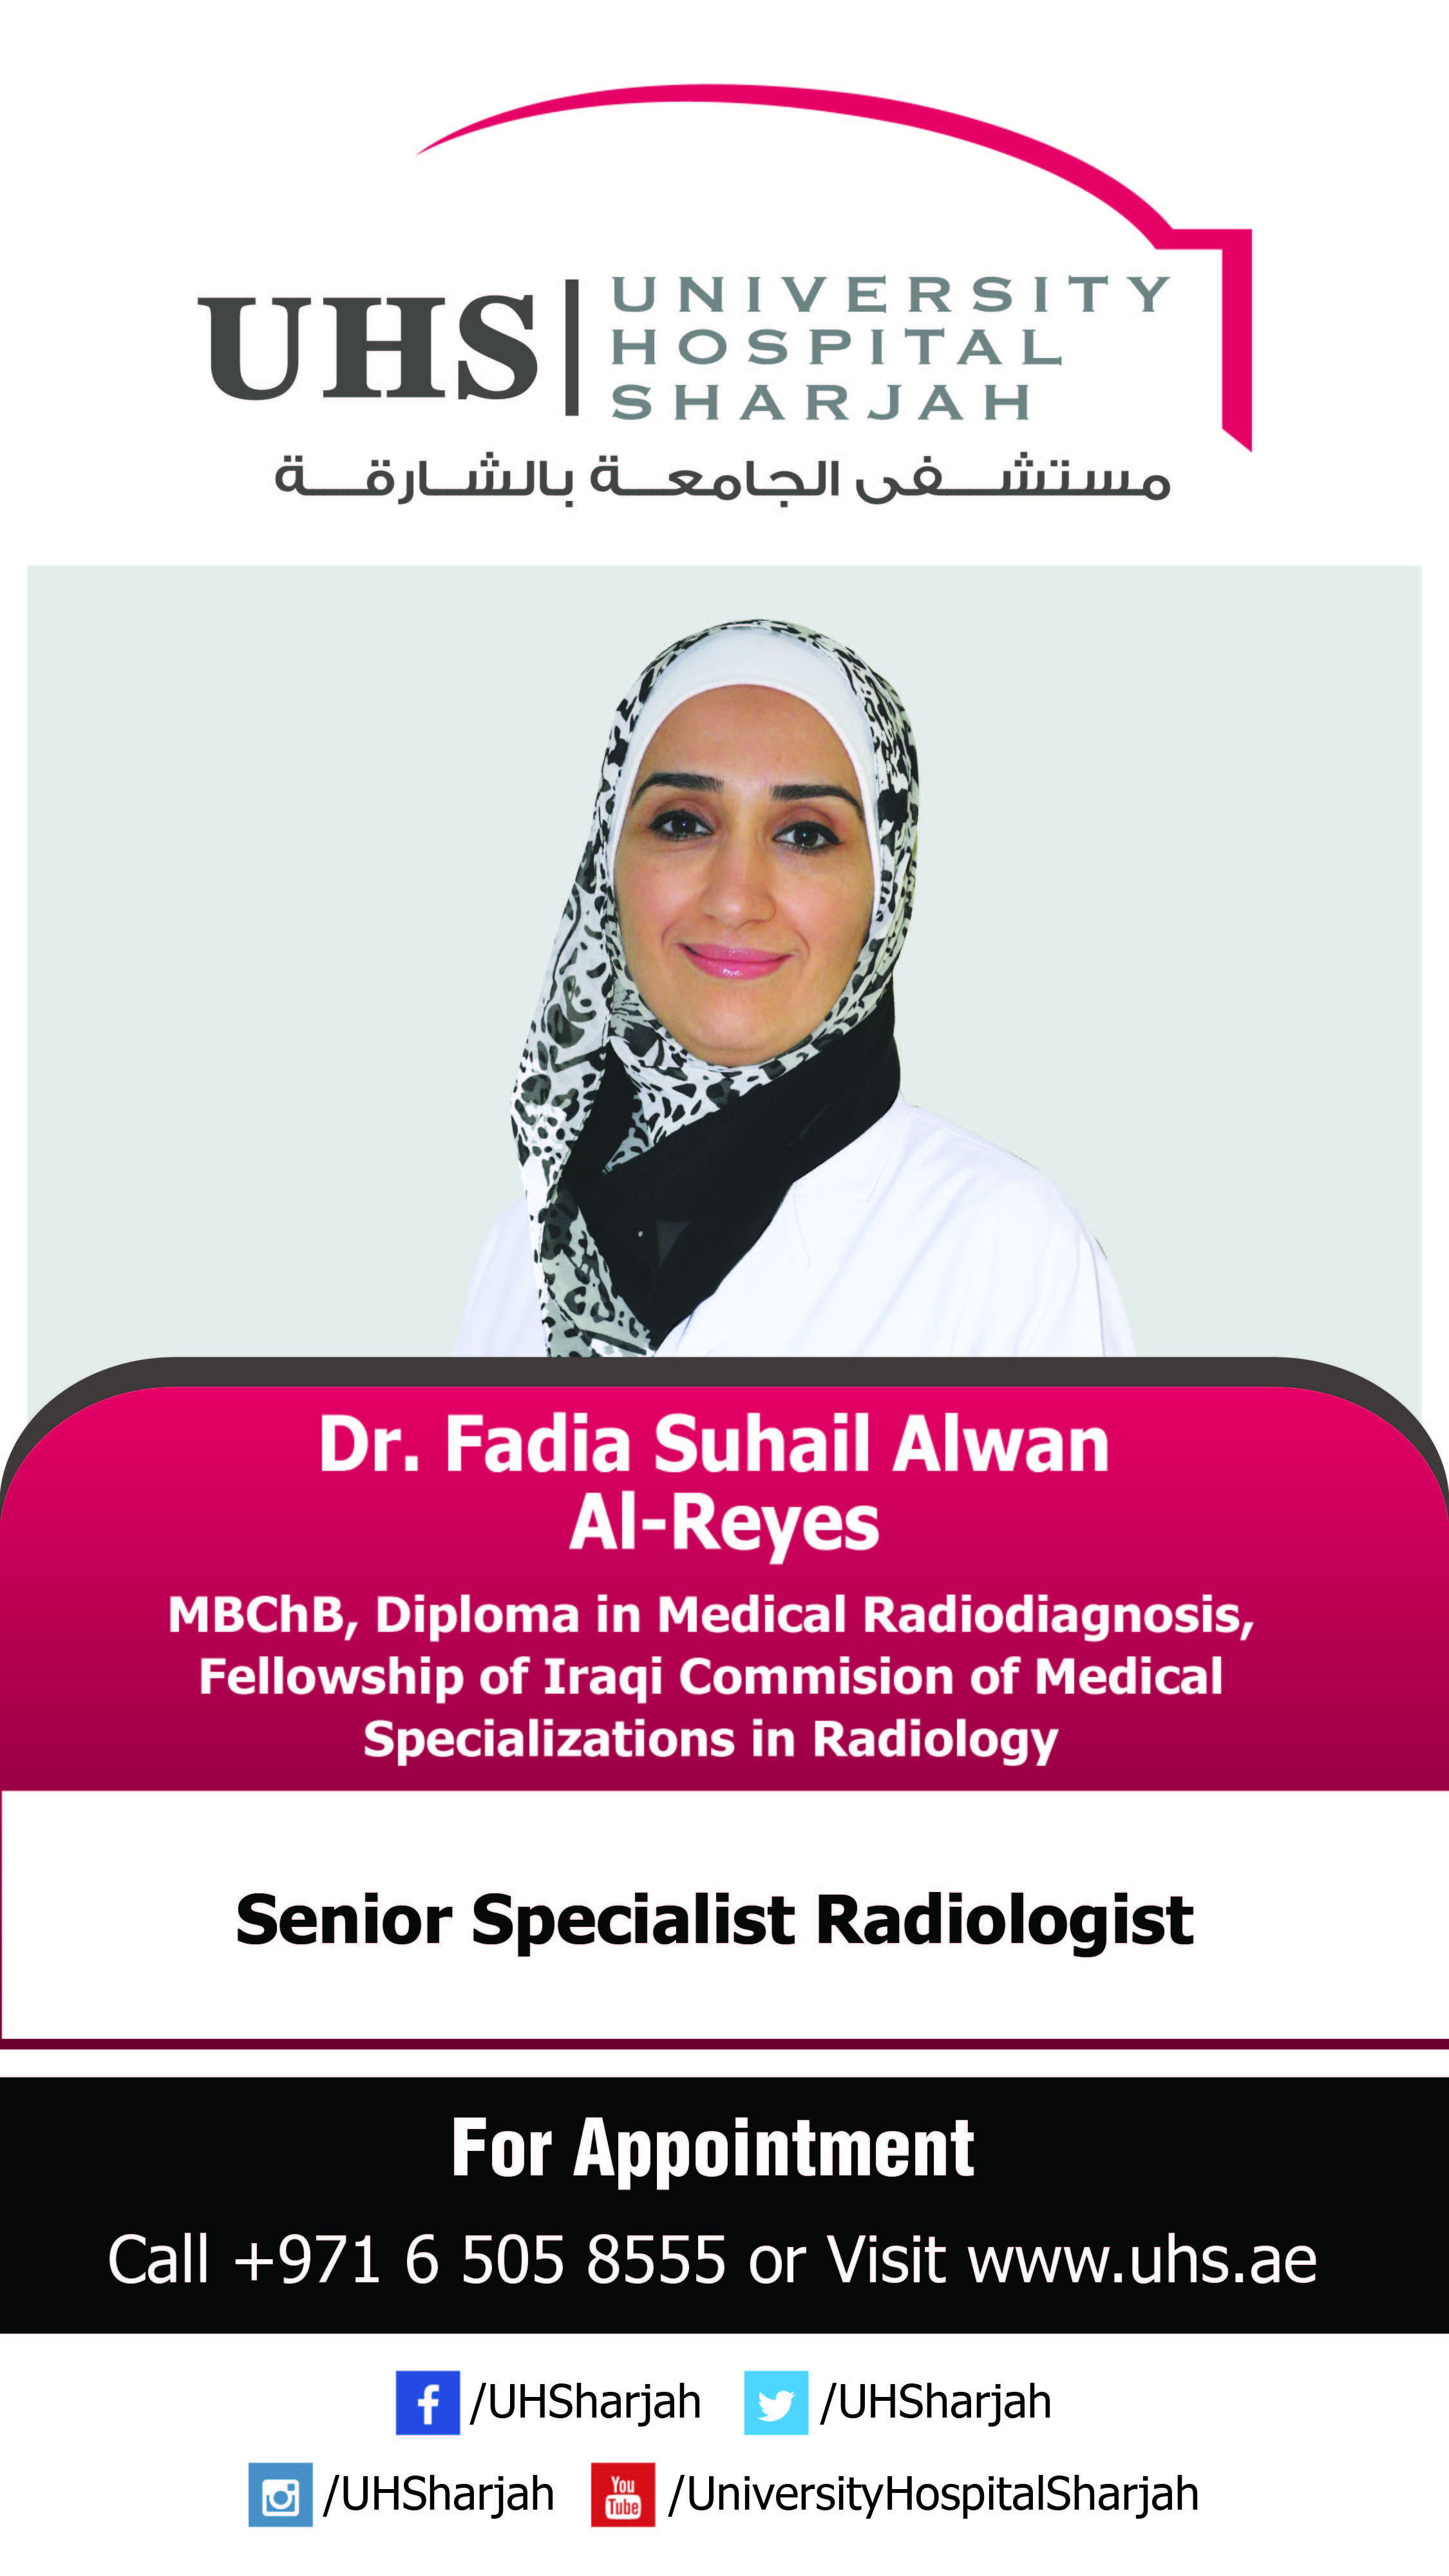 Dr Fadya Suhail Alwan Al Rayes Senior Specialist Radiologist At University Hospital Sharjah Dr Fadya Is An Iraqi Board Radiologist Health Care Testimonials